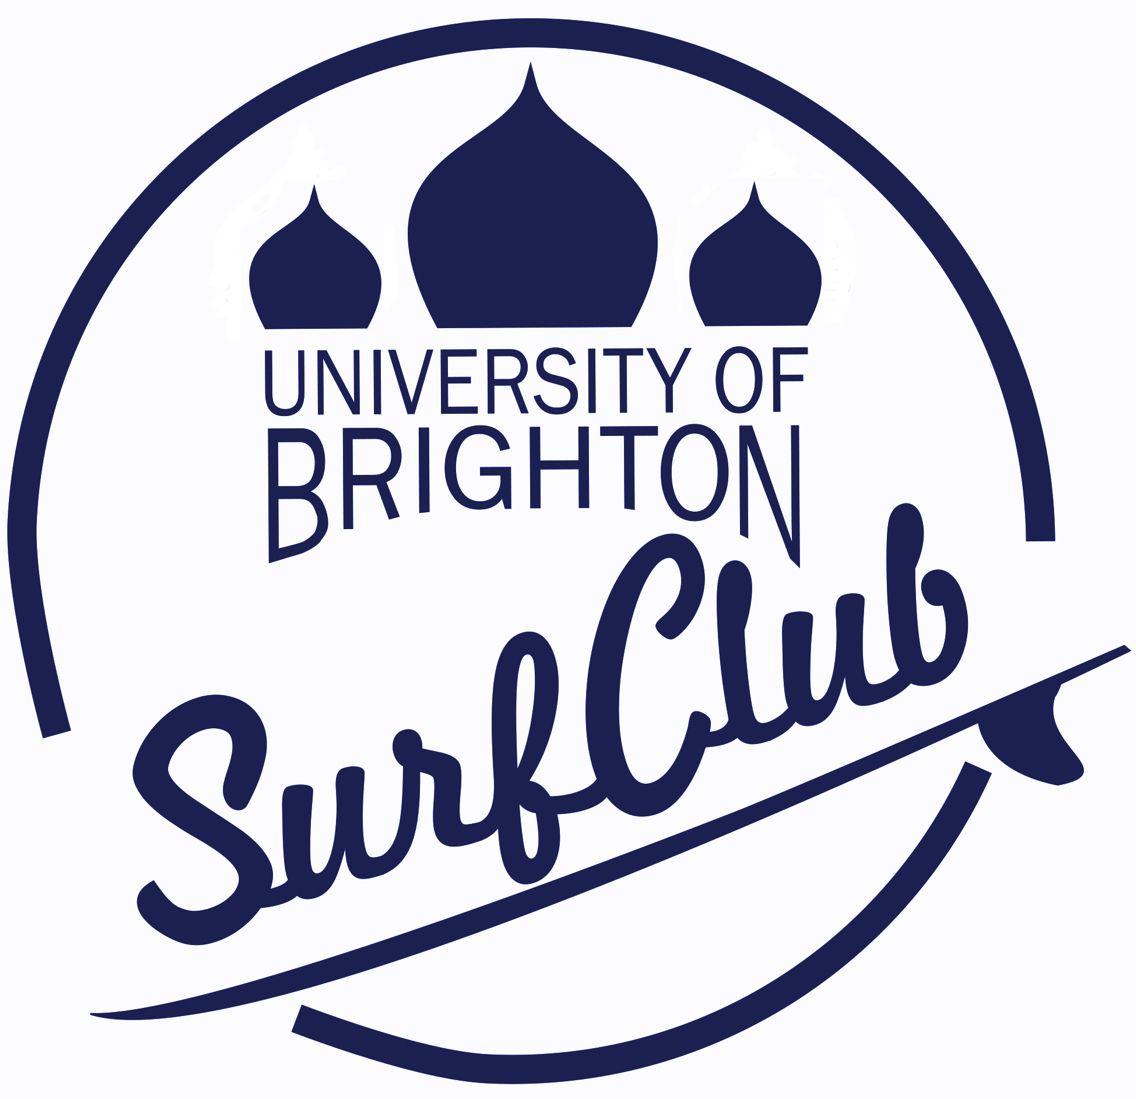 The University of Brighton Surf Club Logo.   Surfing   Pinterest ...